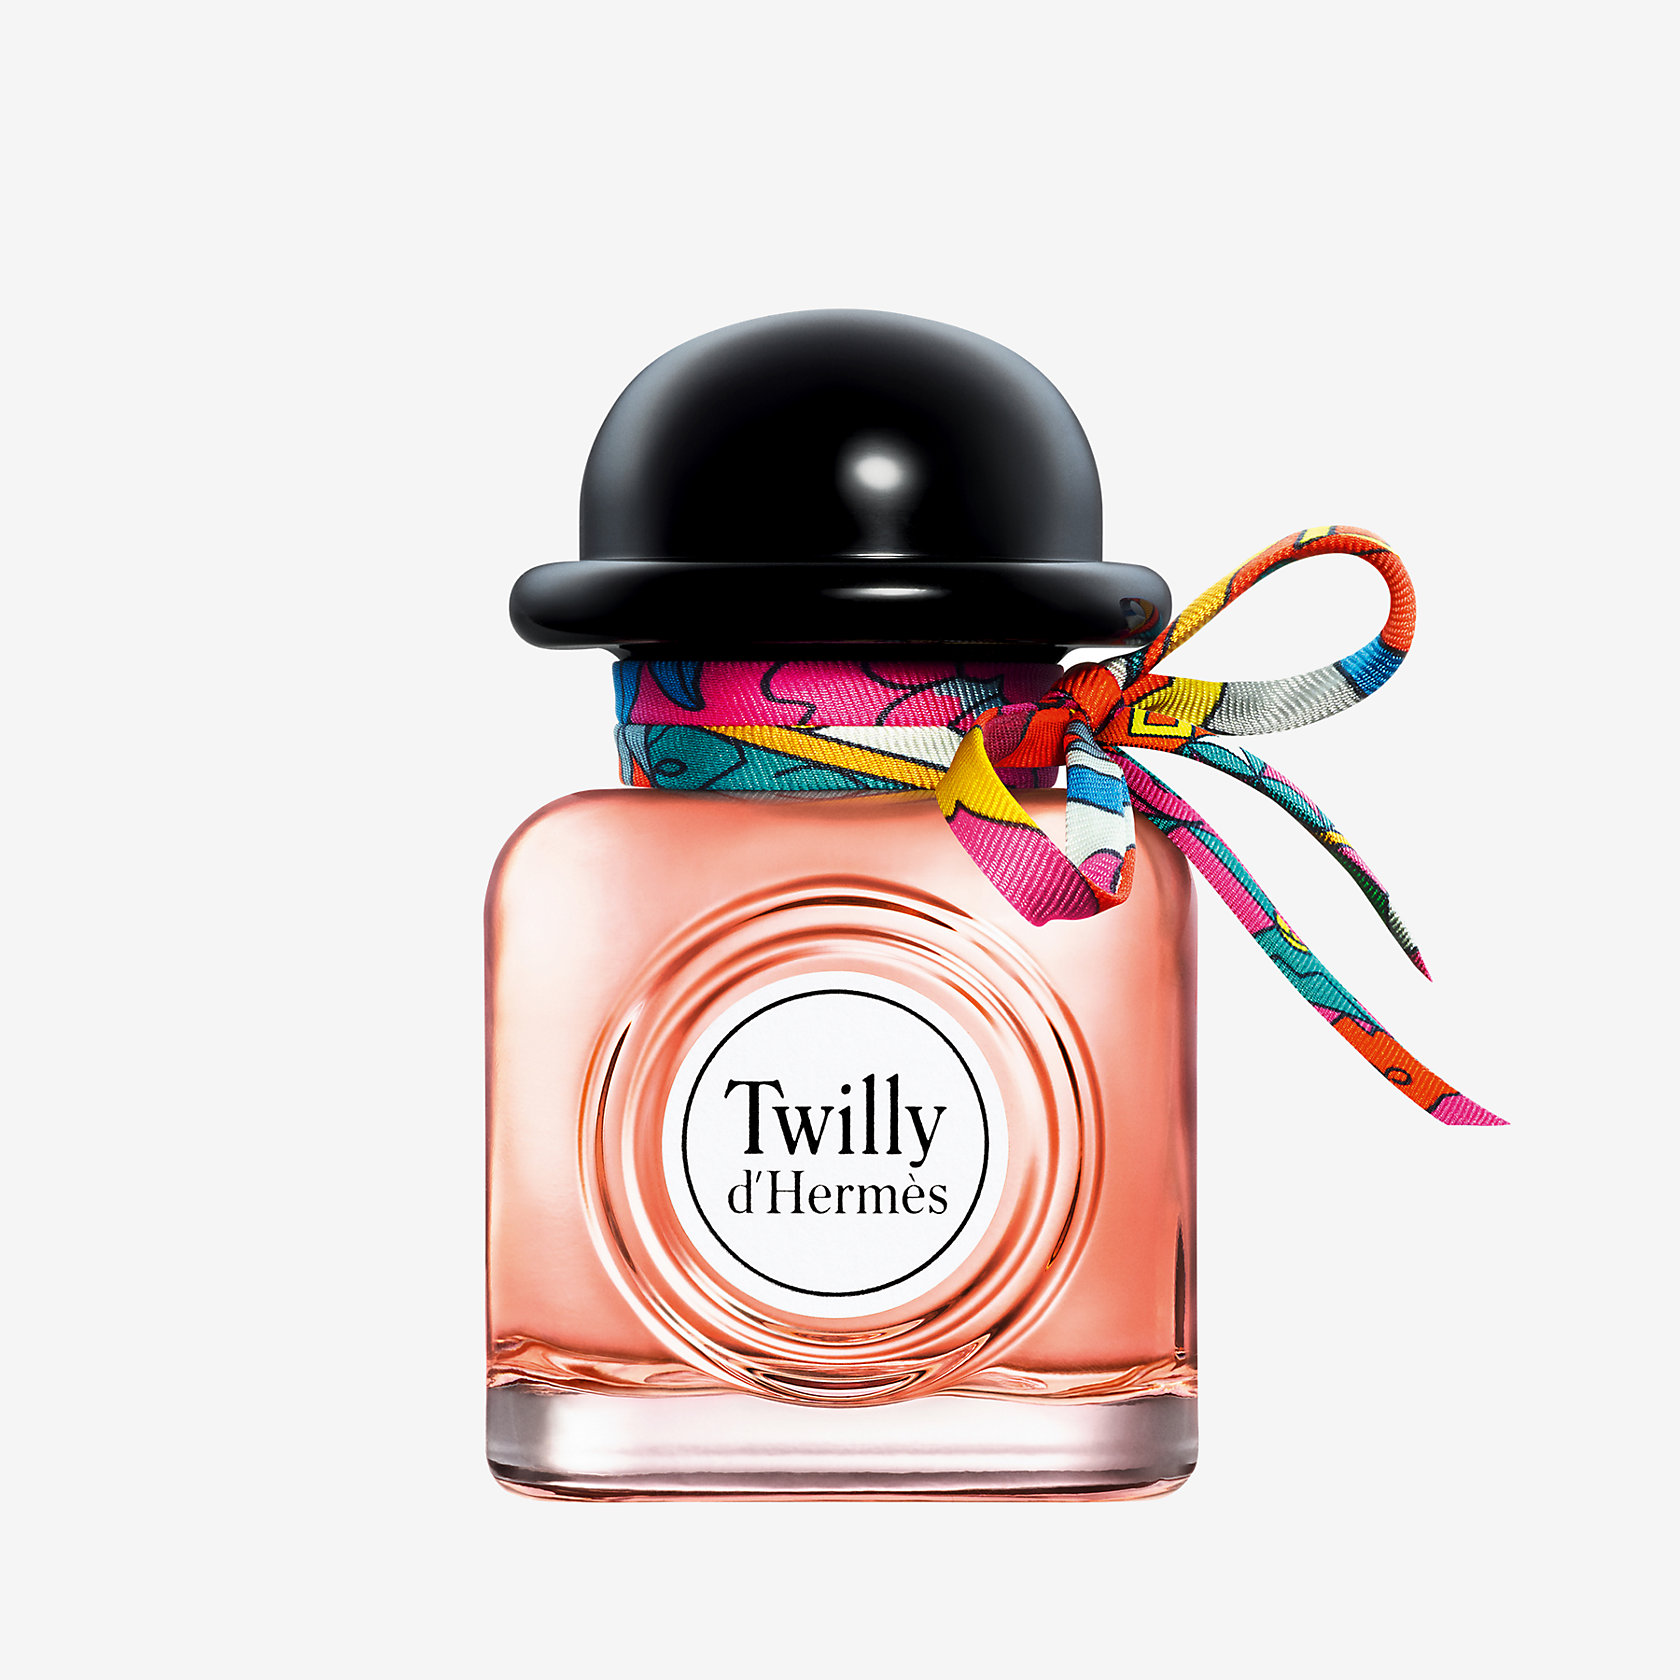 hermes parfum twilly